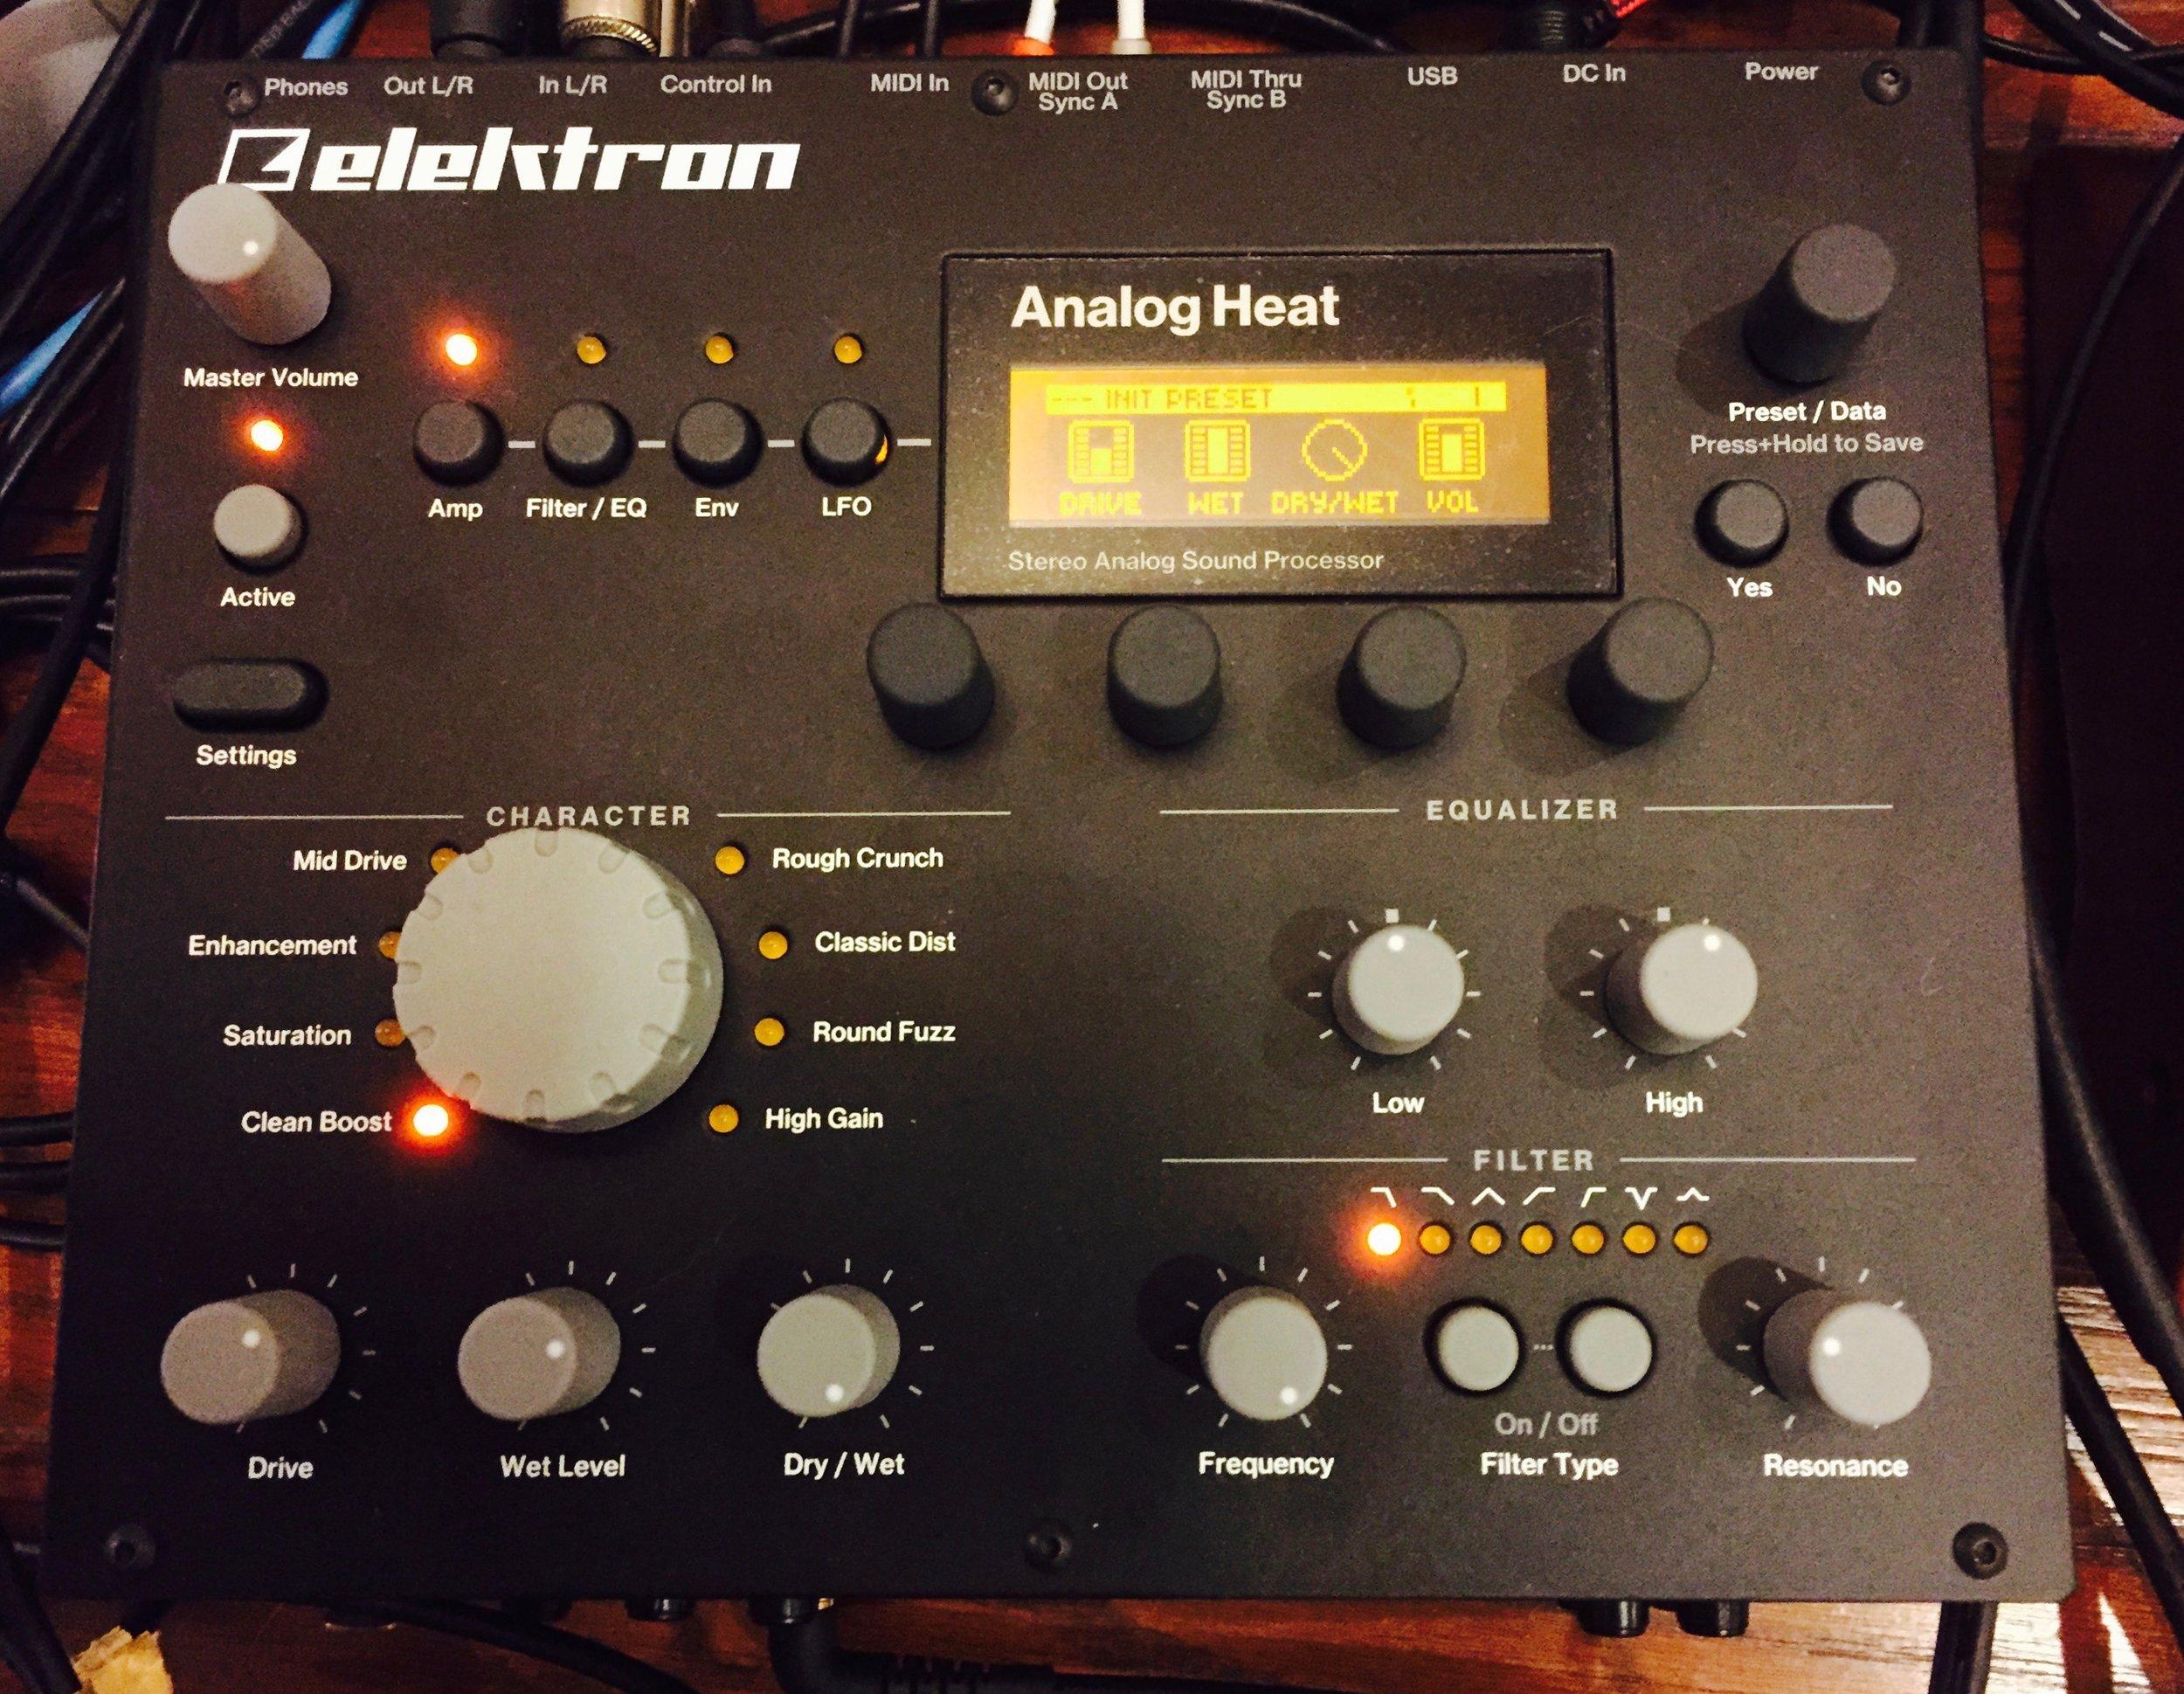 The Elektron Analog Heat Stereo Analog Sound Processor